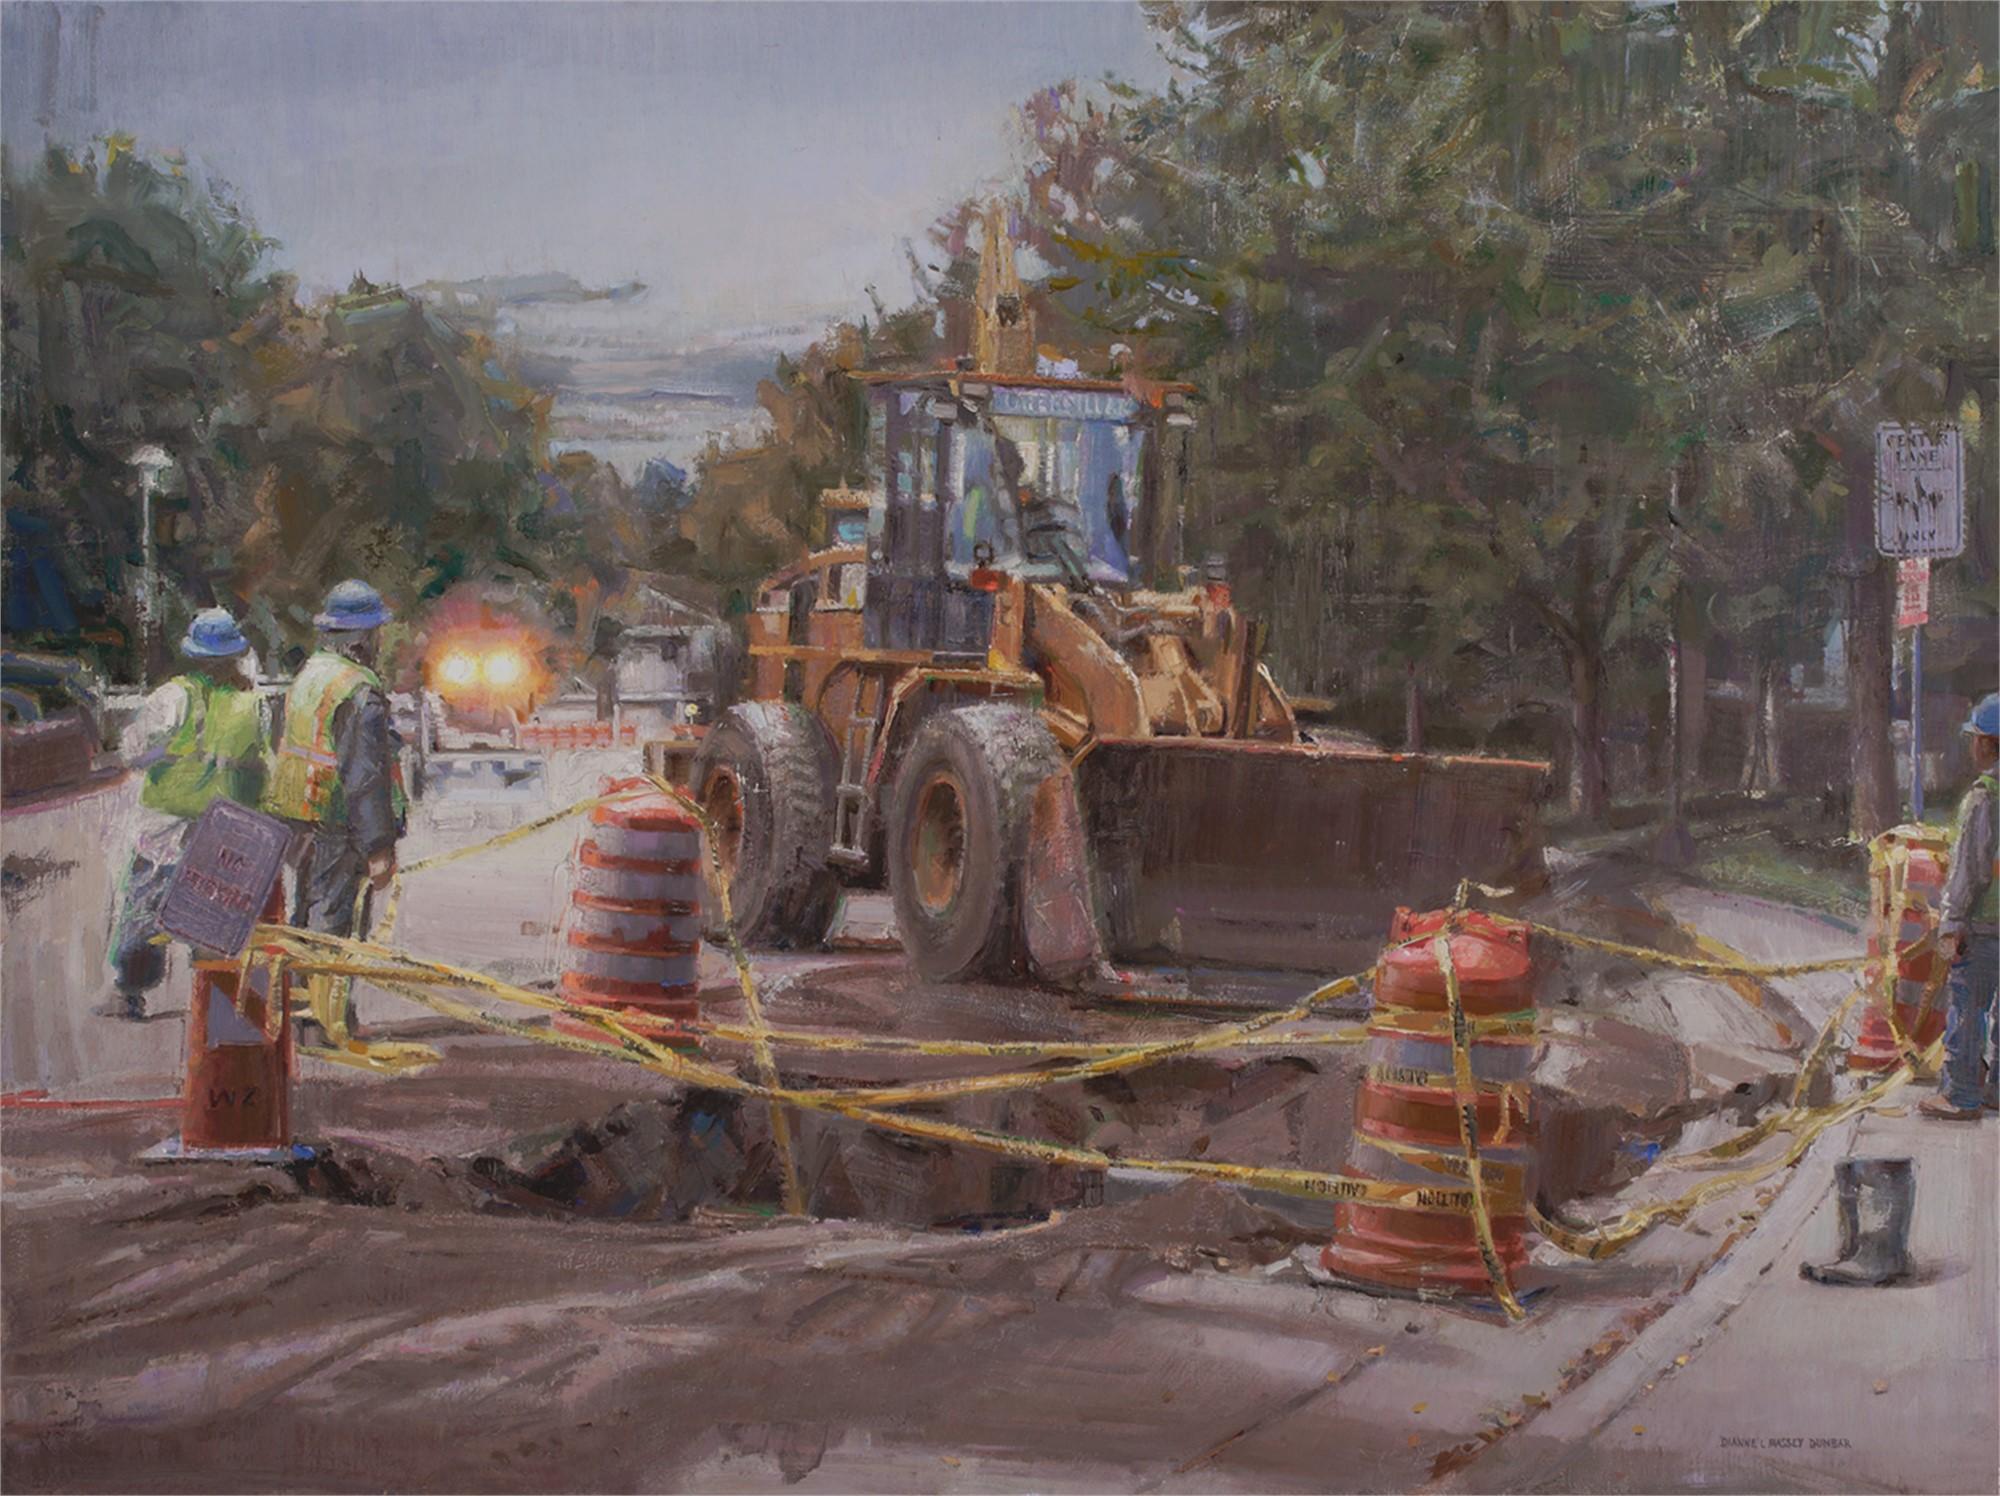 A Long Day's Work by Dianne L Massey Dunbar